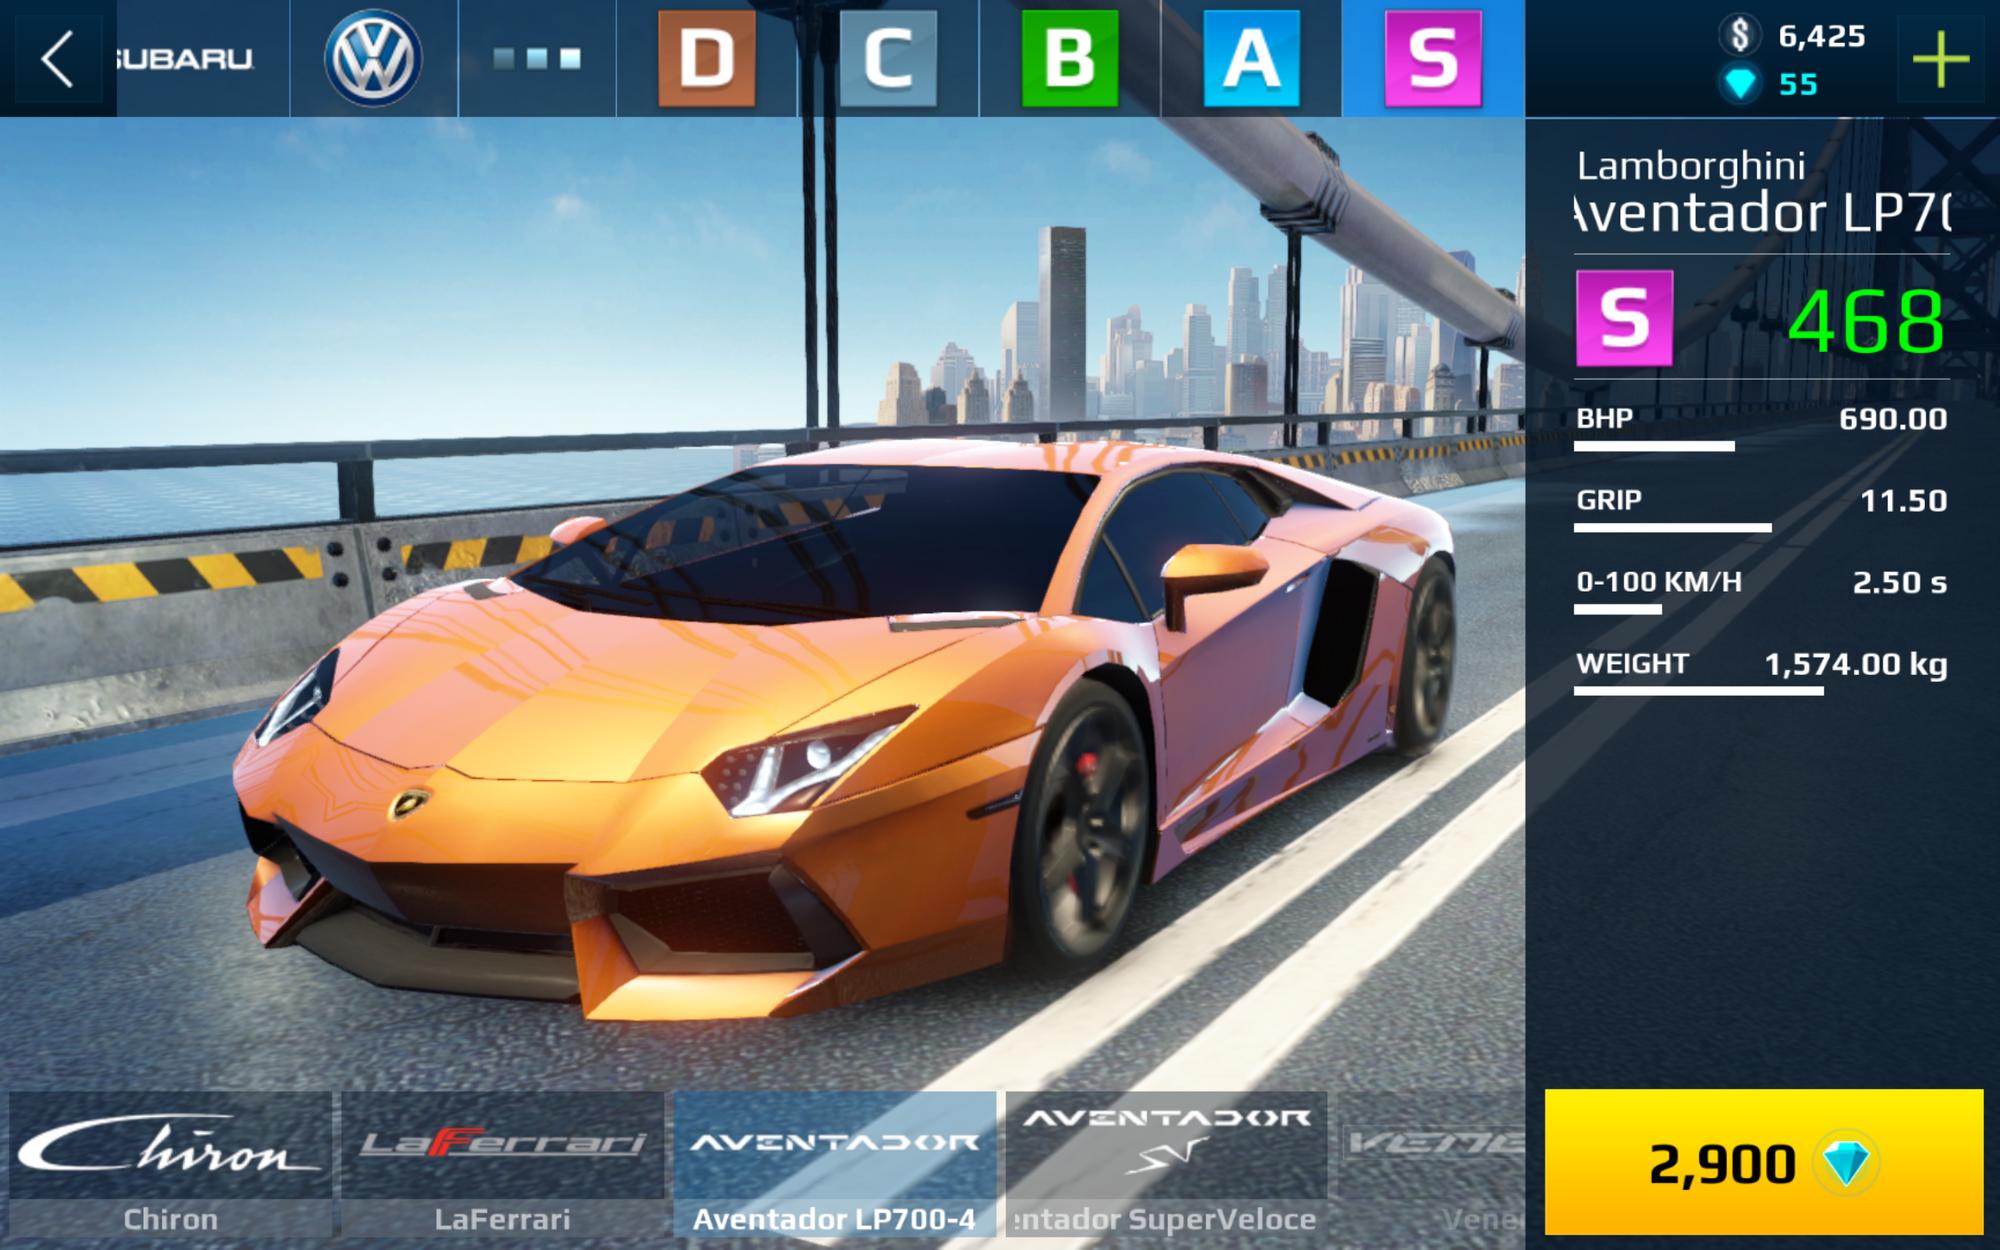 Lamborghini Aventador Lp 700 4 Asphalt Wiki Fandom Powered By Wikia